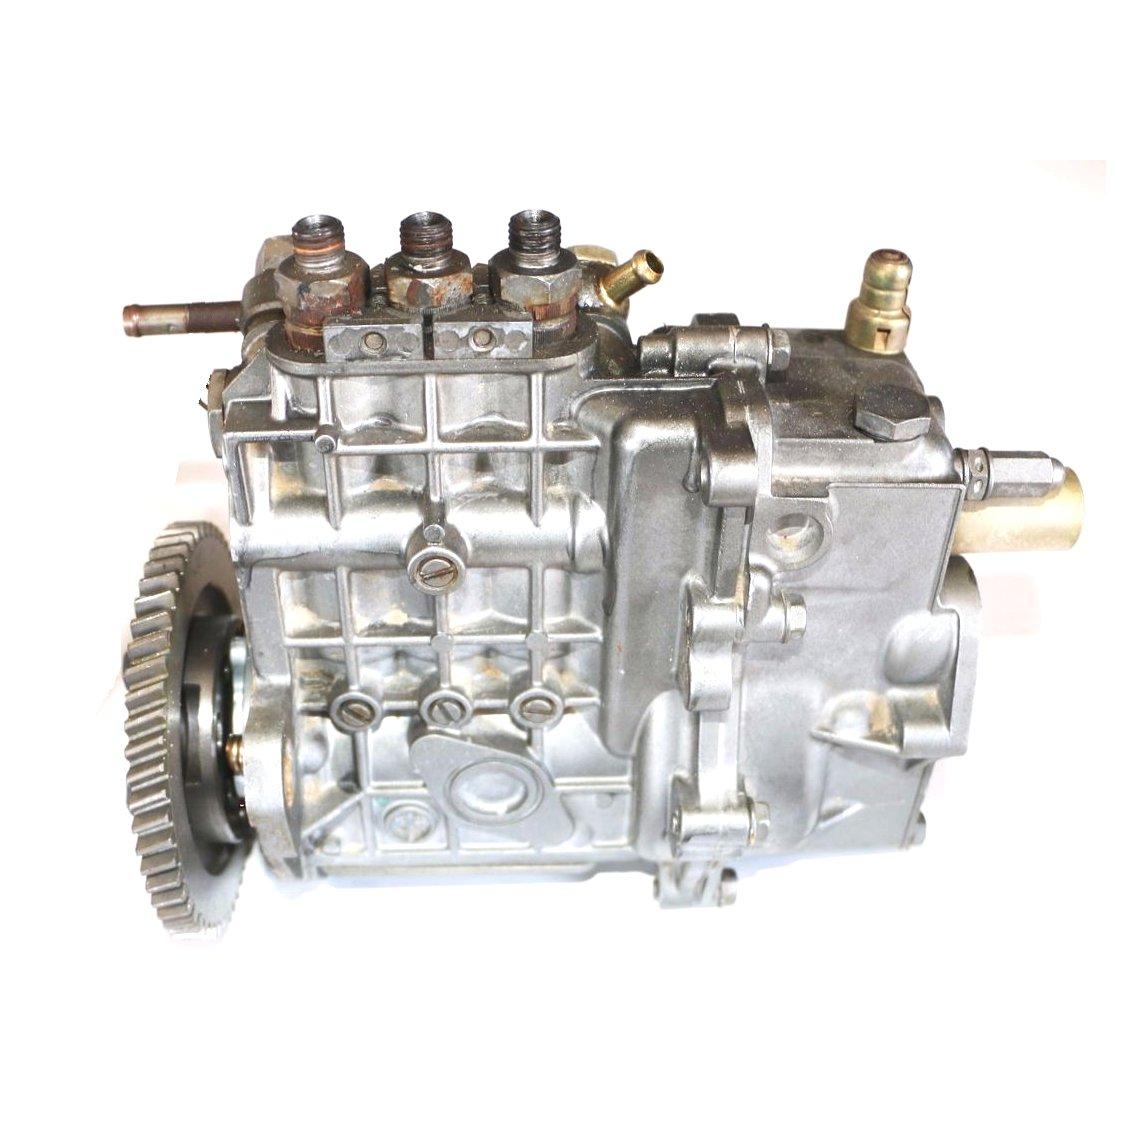 Overhaul repair kit for yanmar 3tne injection pumps diesel overhaul repair kit for yanmar 3tne injection pumps ccuart Gallery